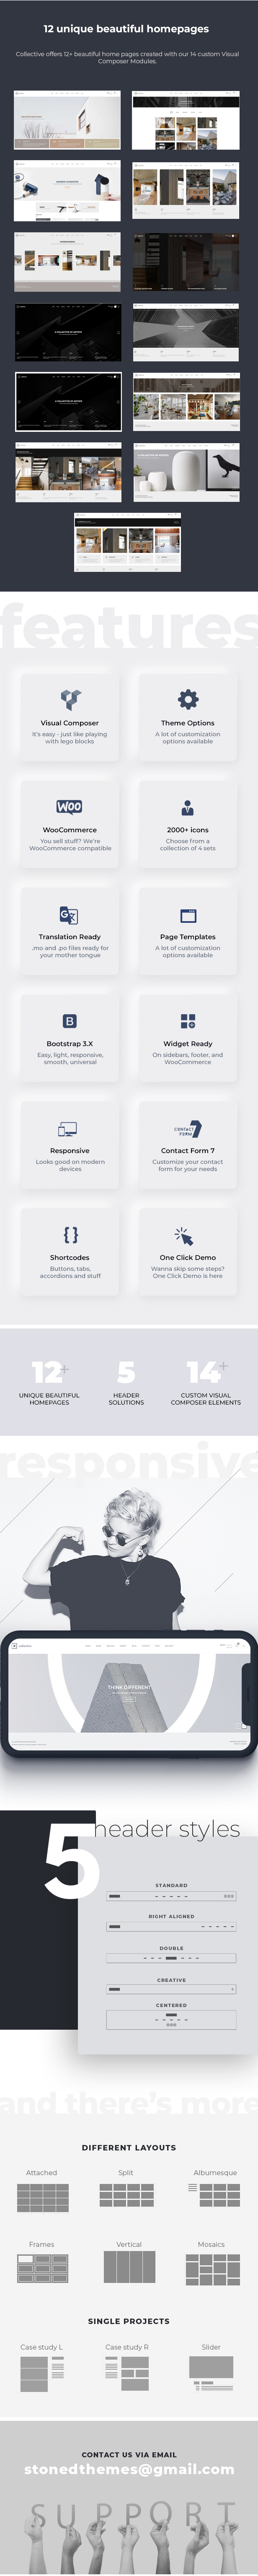 Collective - Minimal WordPress Theme - 2